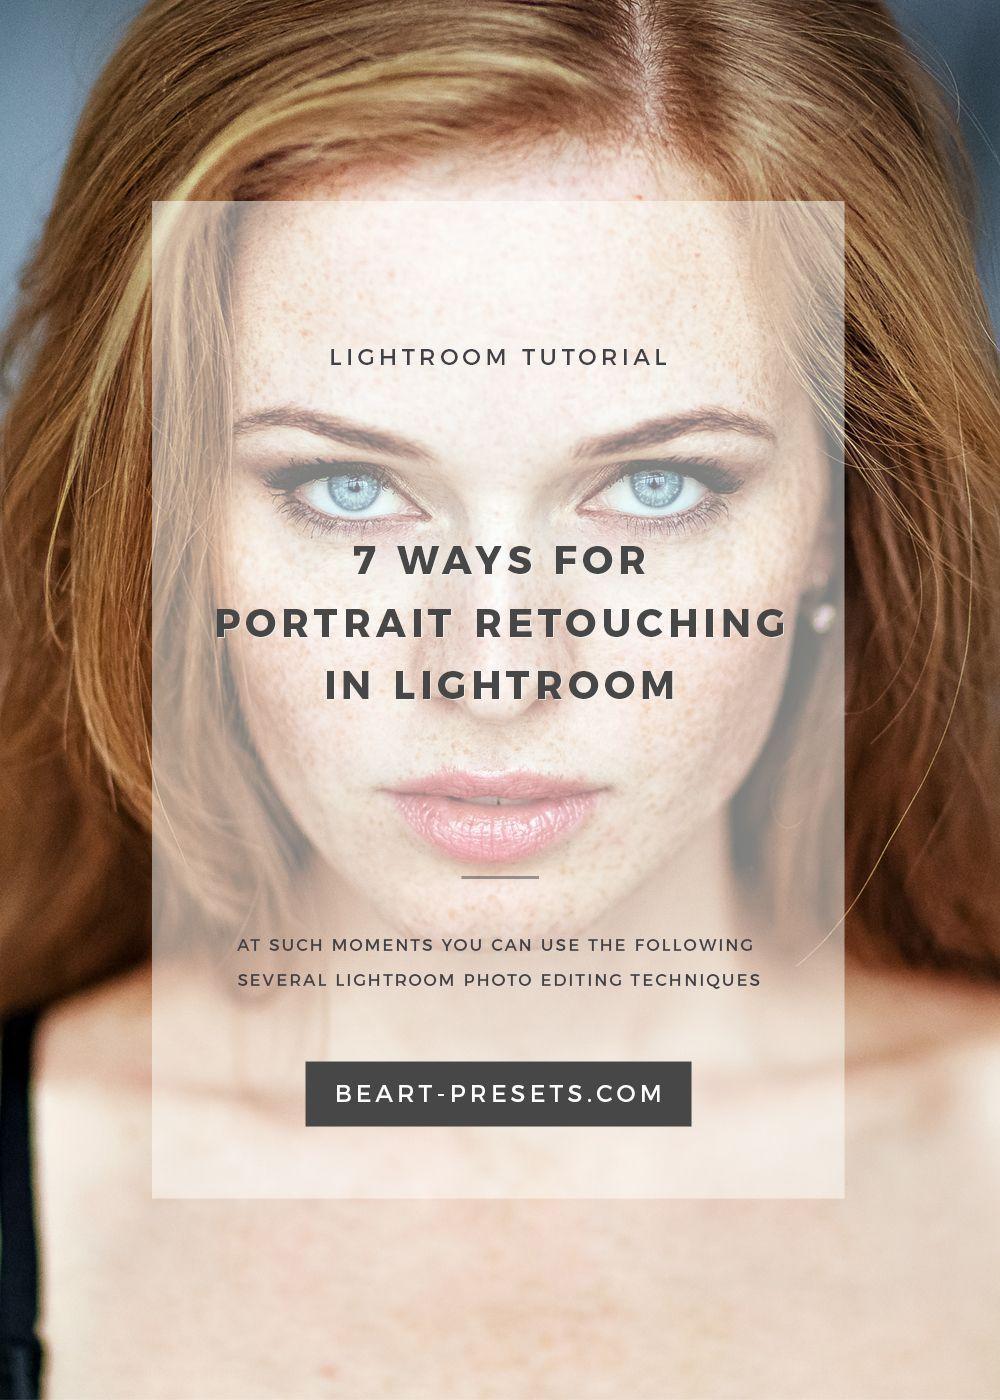 Lightroom portrait editing tips